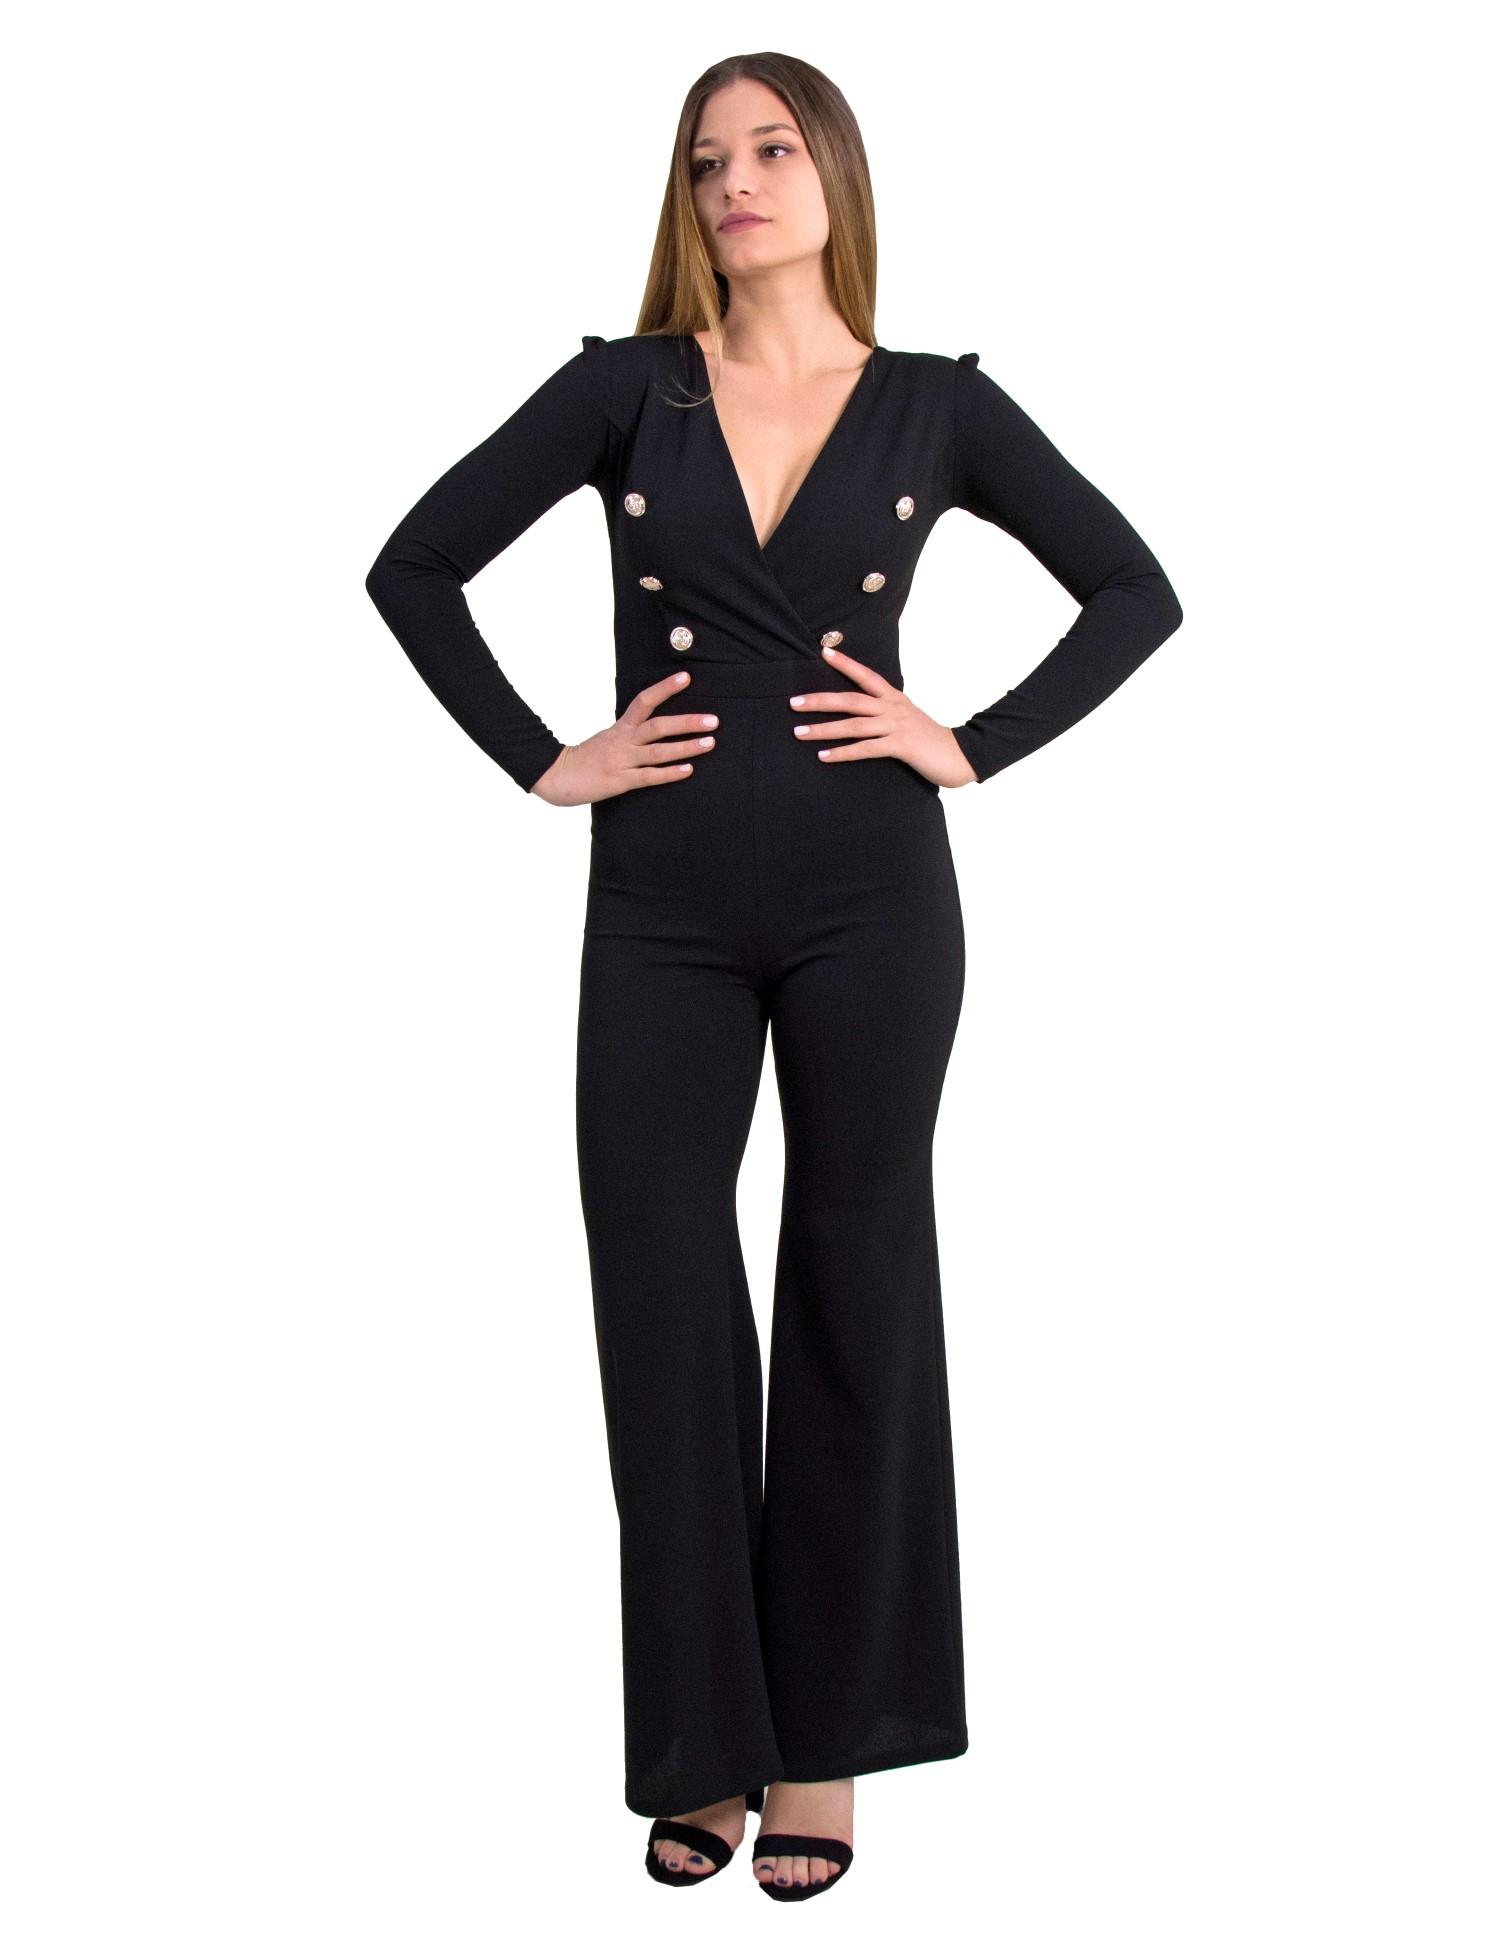 874294681b76 Γυναικεία ολόσωμη κρουαζέ φόρμα Cocktail μαύρη κουμπιά 014009000 ...